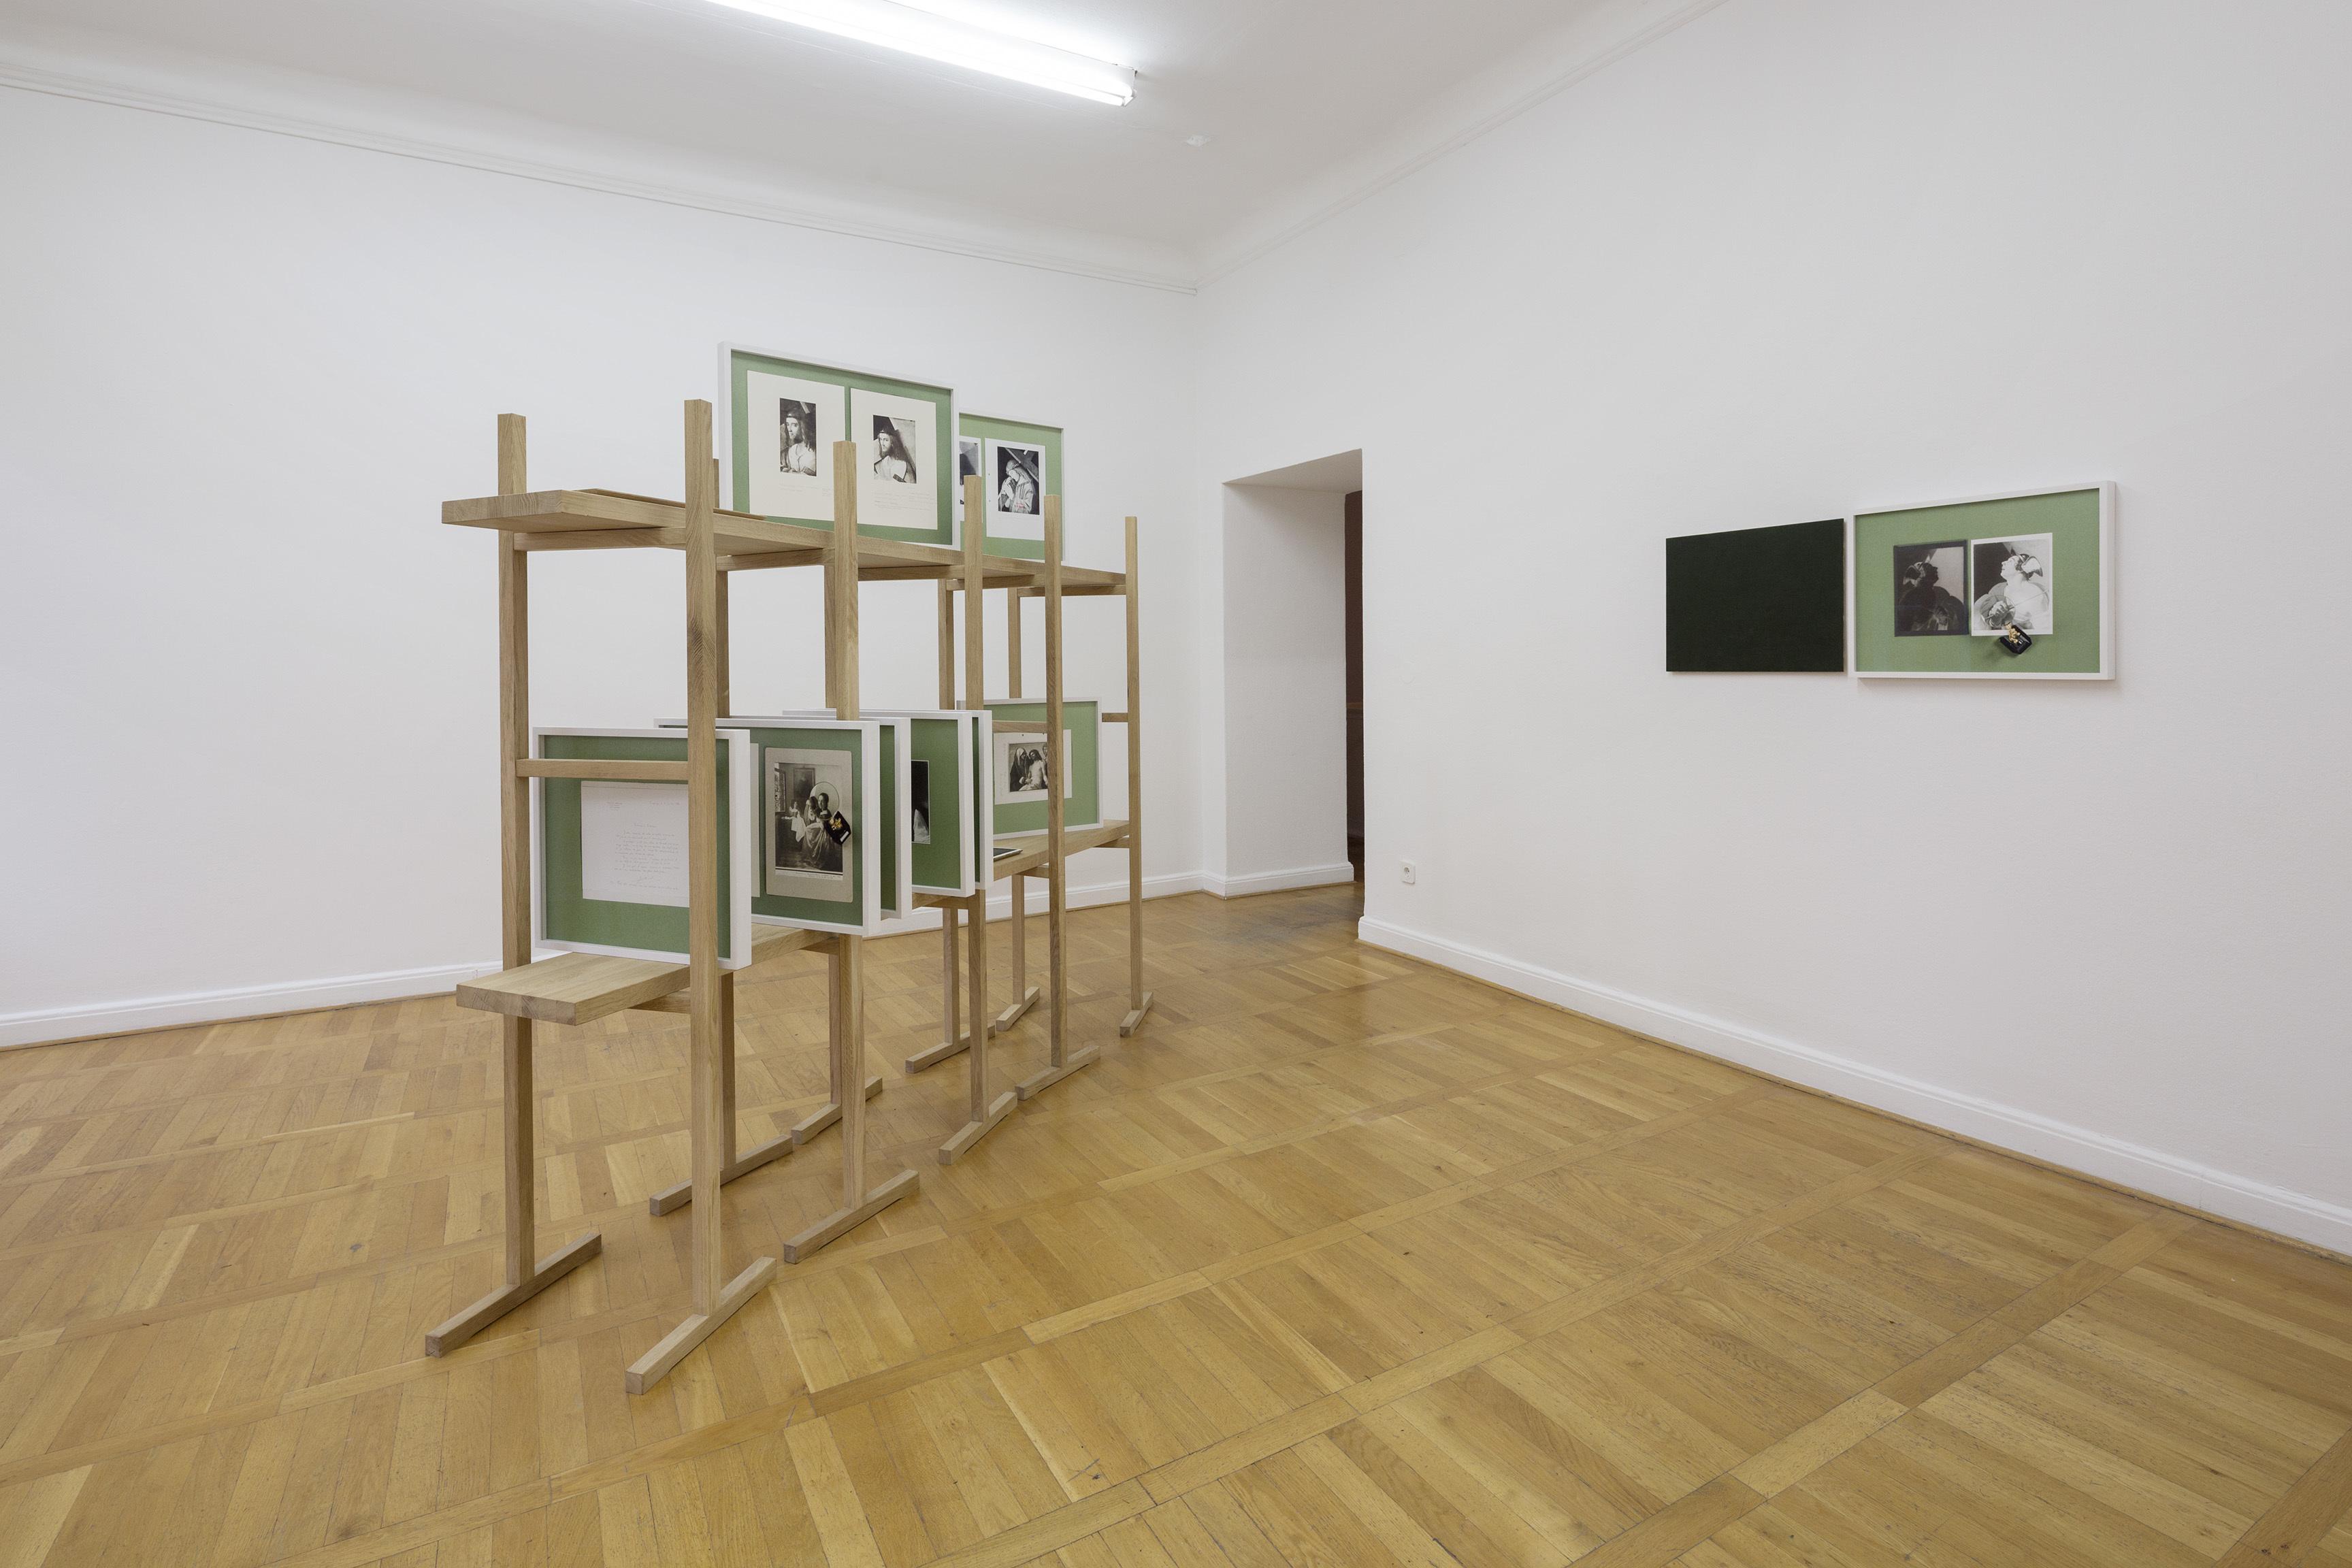 "Matts Leiderstam, ""Oko konesera"", 2014, dzięki uprzejmości Matts Leiderstam; Andréhn-Schiptjenko, Stockholm © Matts Leiderstam / VG Bild-Kunst, Bonn 2014, fot.Anders Sune Berg"